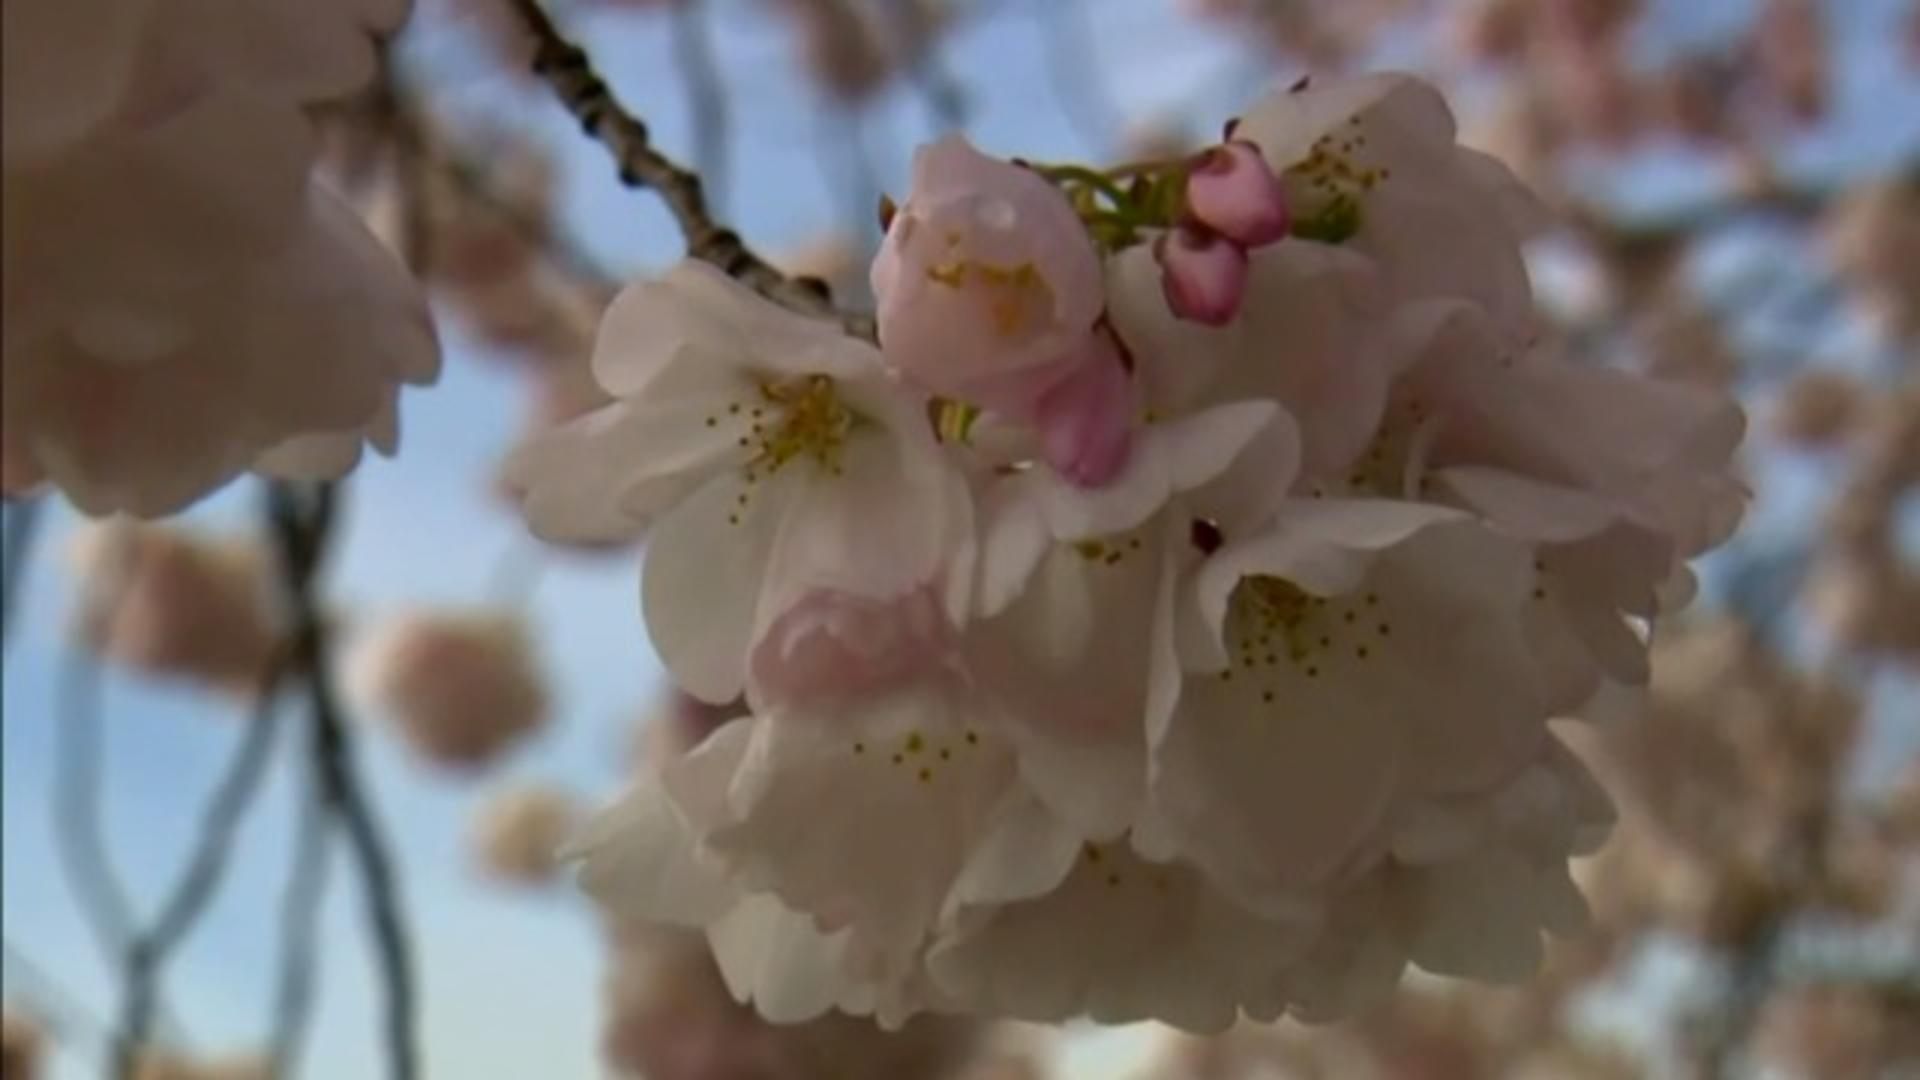 Nature: Cherry blossoms - CBS News